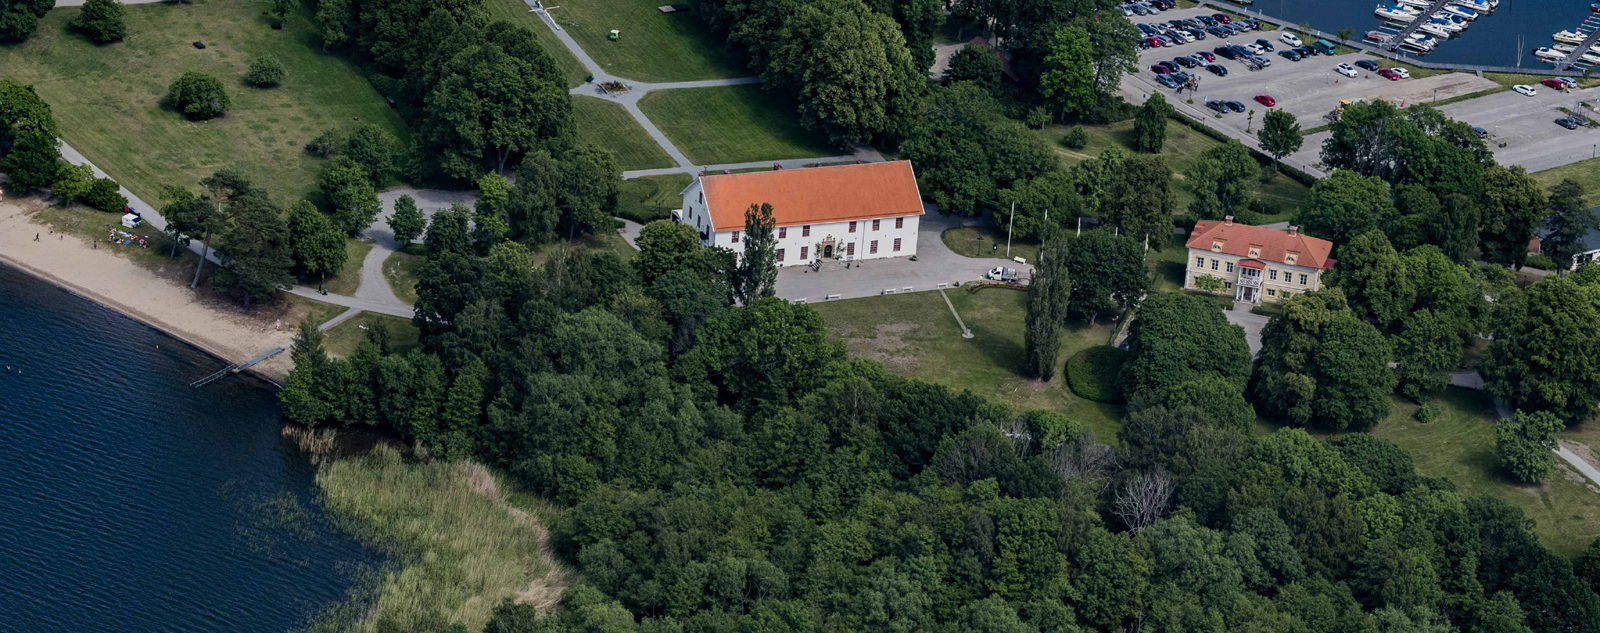 Cykelpaket Sundbyholms slott